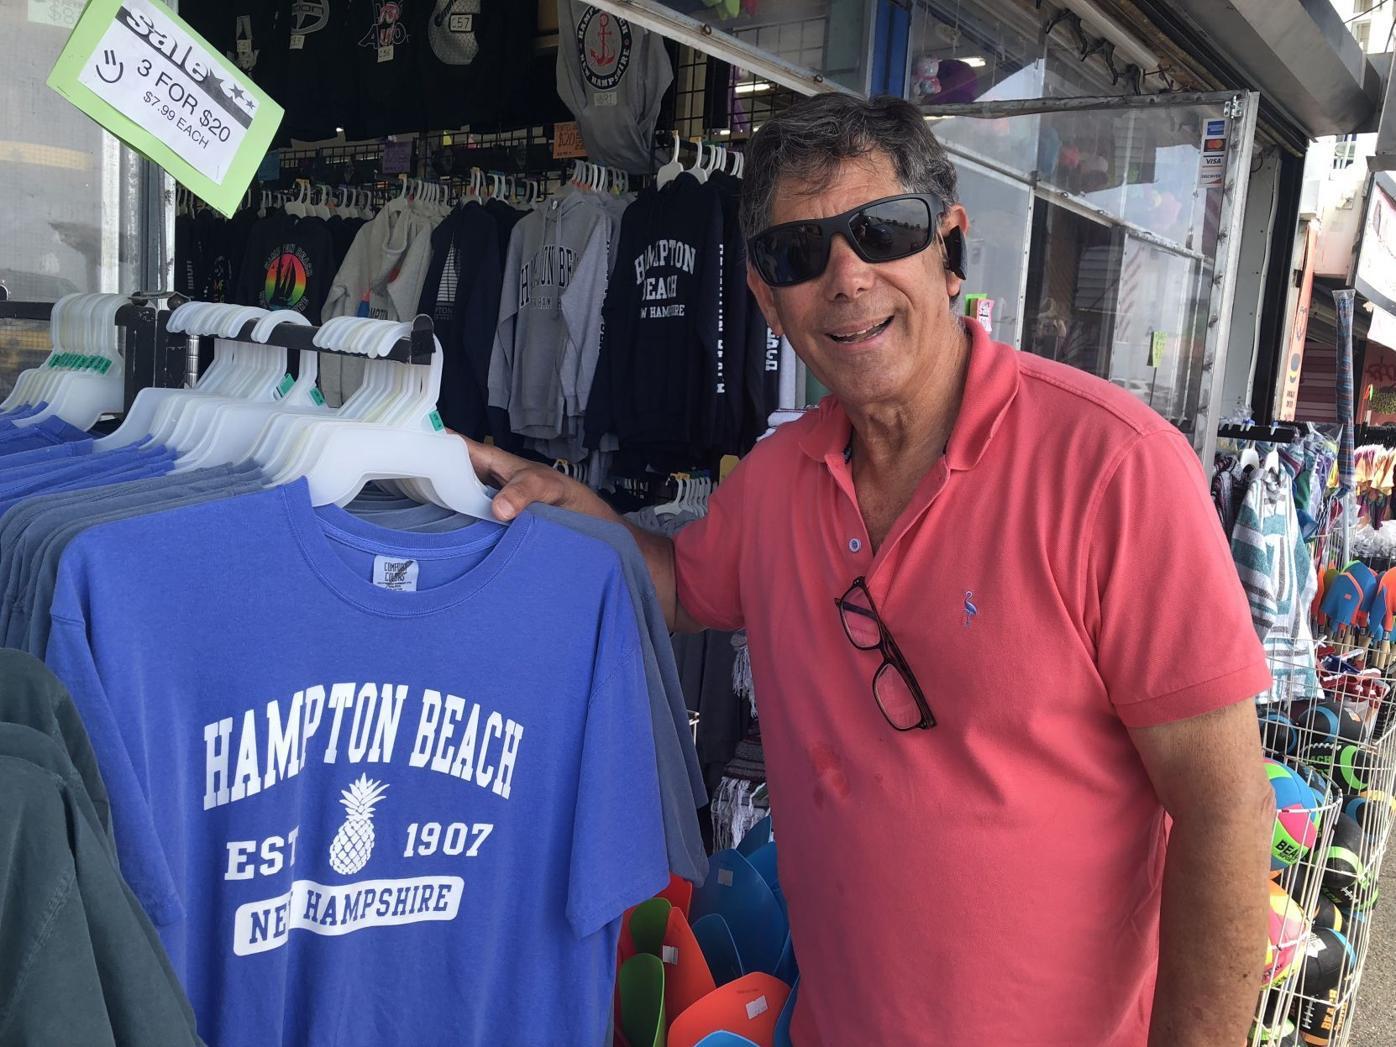 Shirts R' Us at Hampton Beach